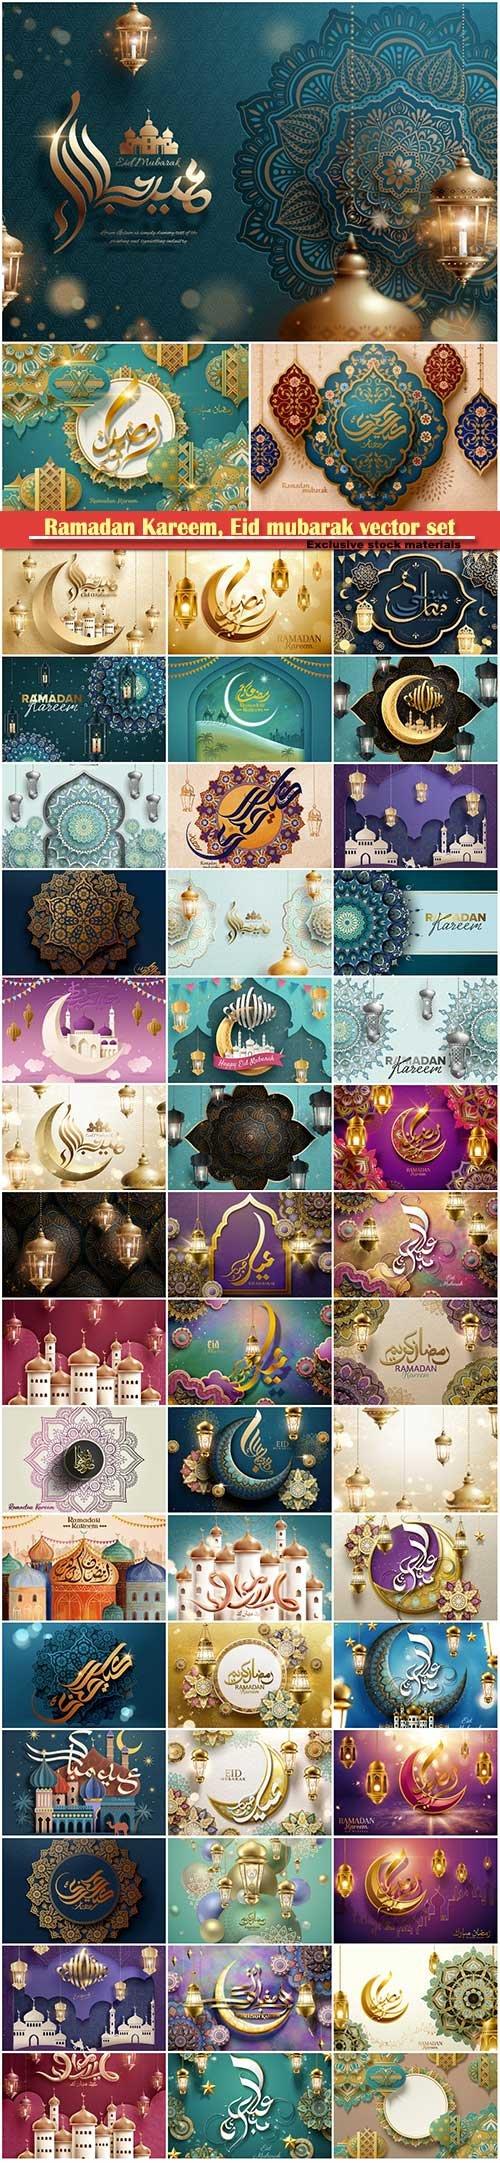 Ramadan Kareem, Eid mubarak vector set # 4